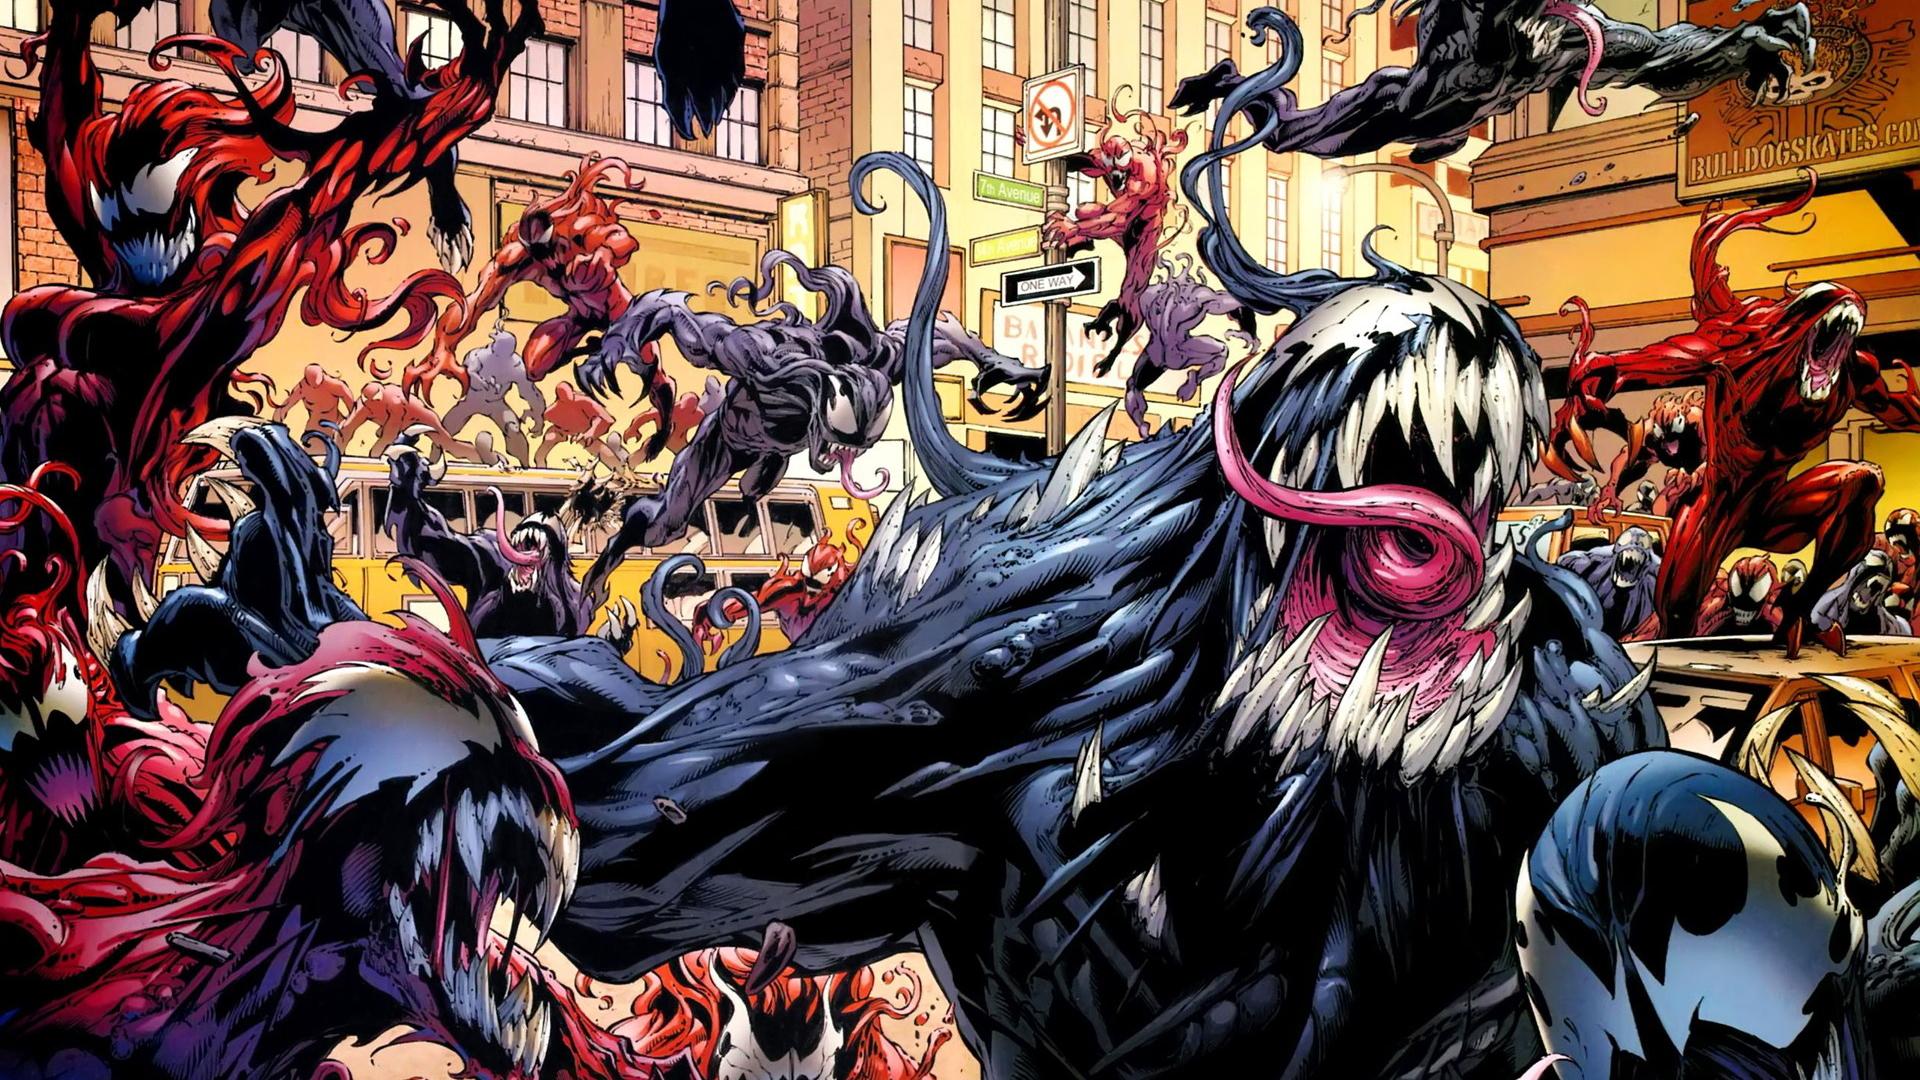 dc-comics-wallpaper-1080p-527.jpg